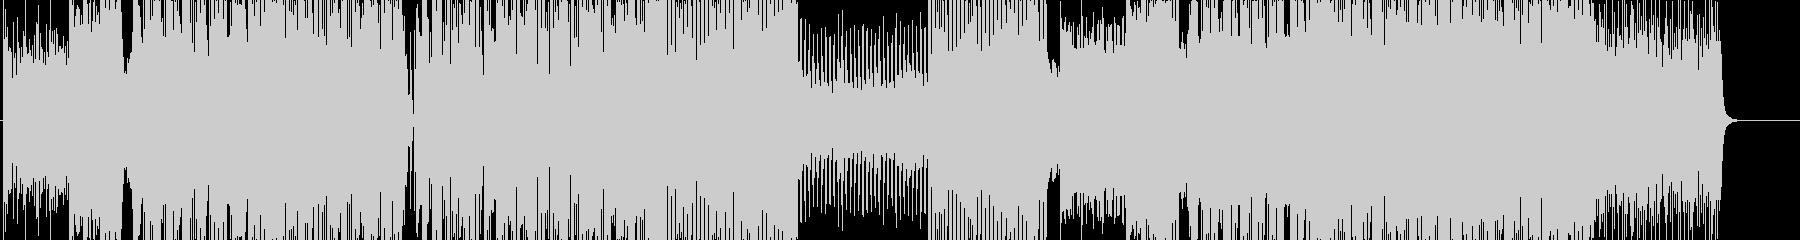 Vlog/メイク動画用フューチャーベースの未再生の波形